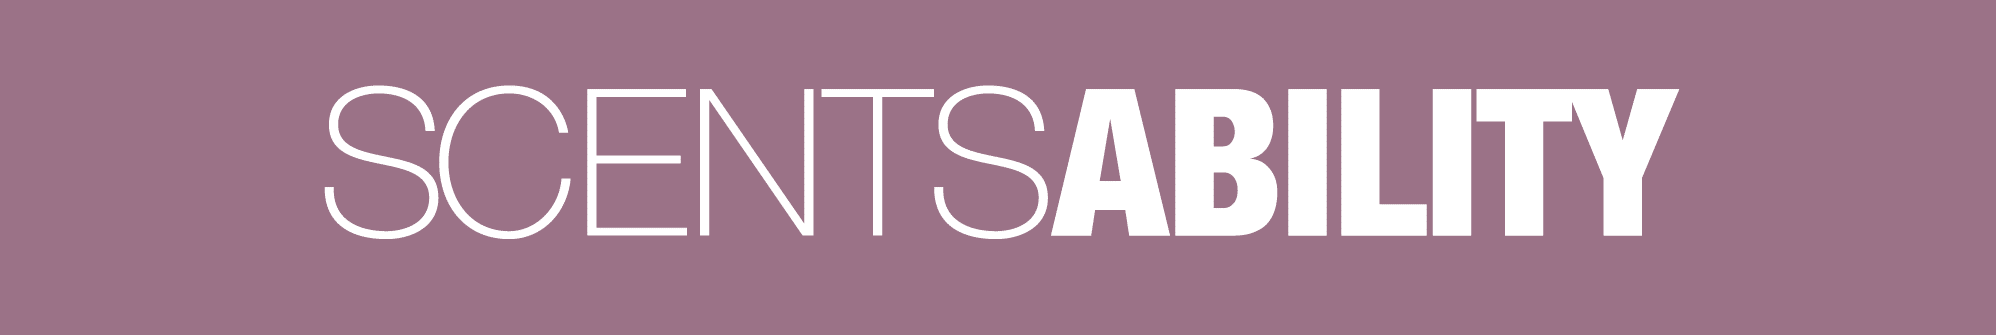 ScentsAbility Logo